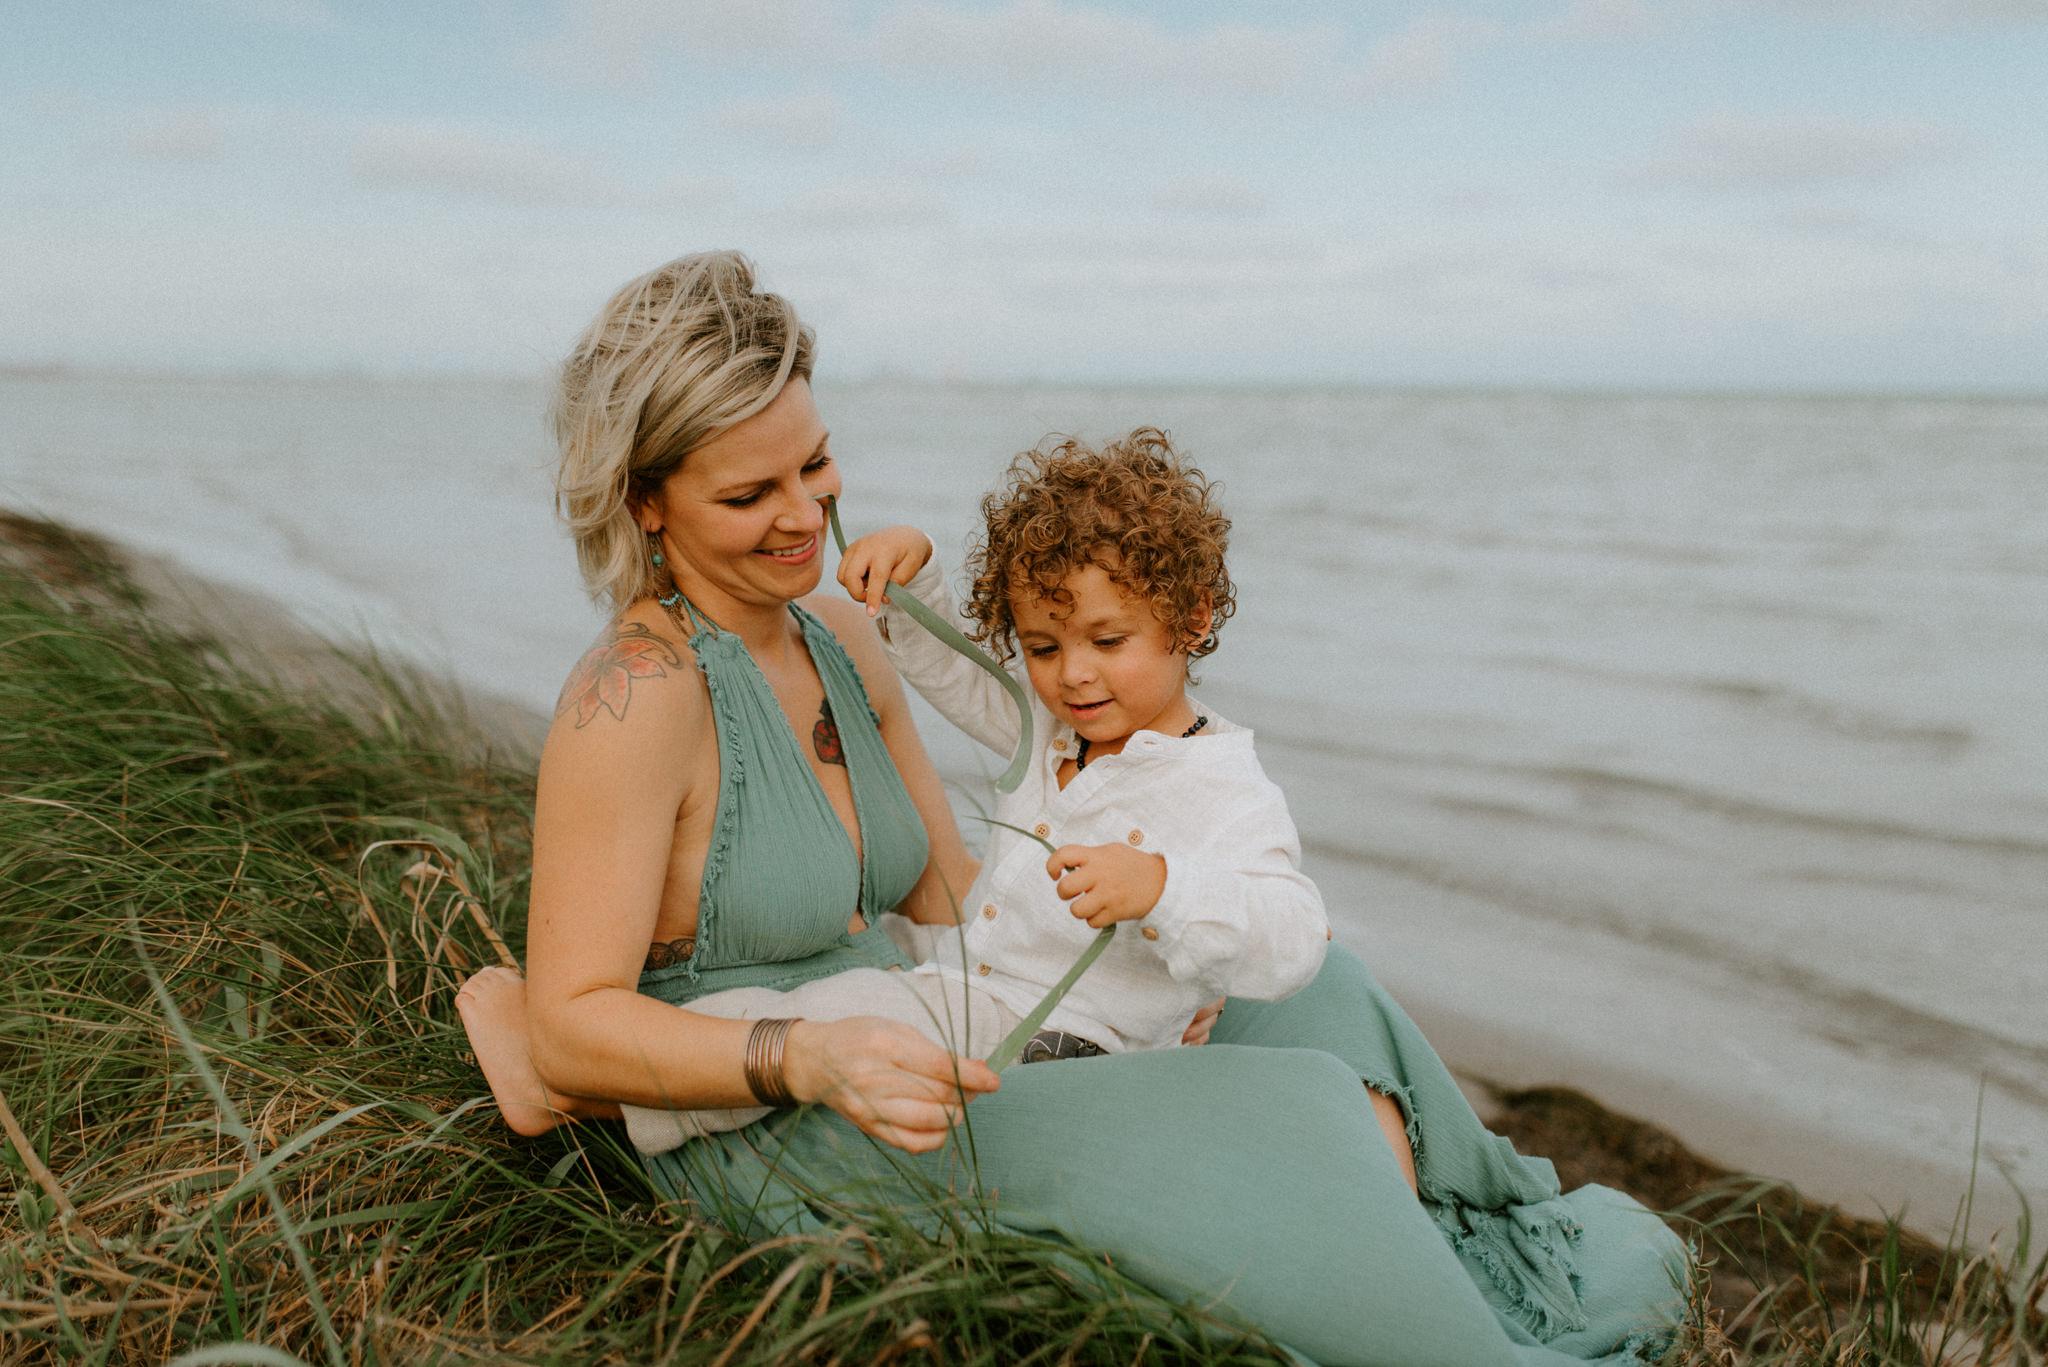 Corpus-Christi-Family-Photographer-Kerlyn-Van-Gelder-Photography44.jpg